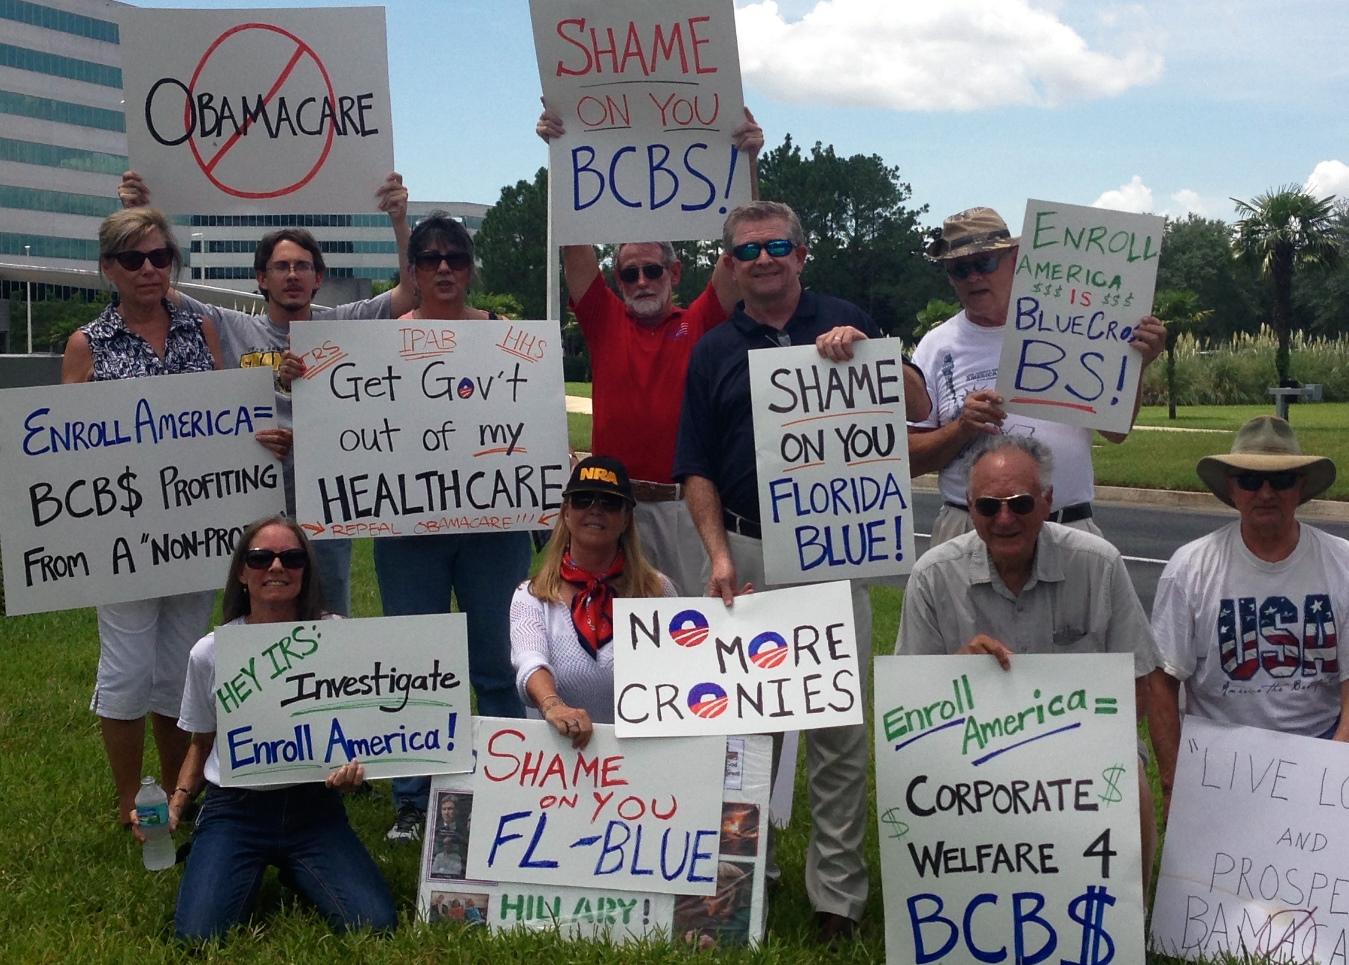 jaxrally AFP FL: Rallies Protesting Enroll America (Multiple Locations)